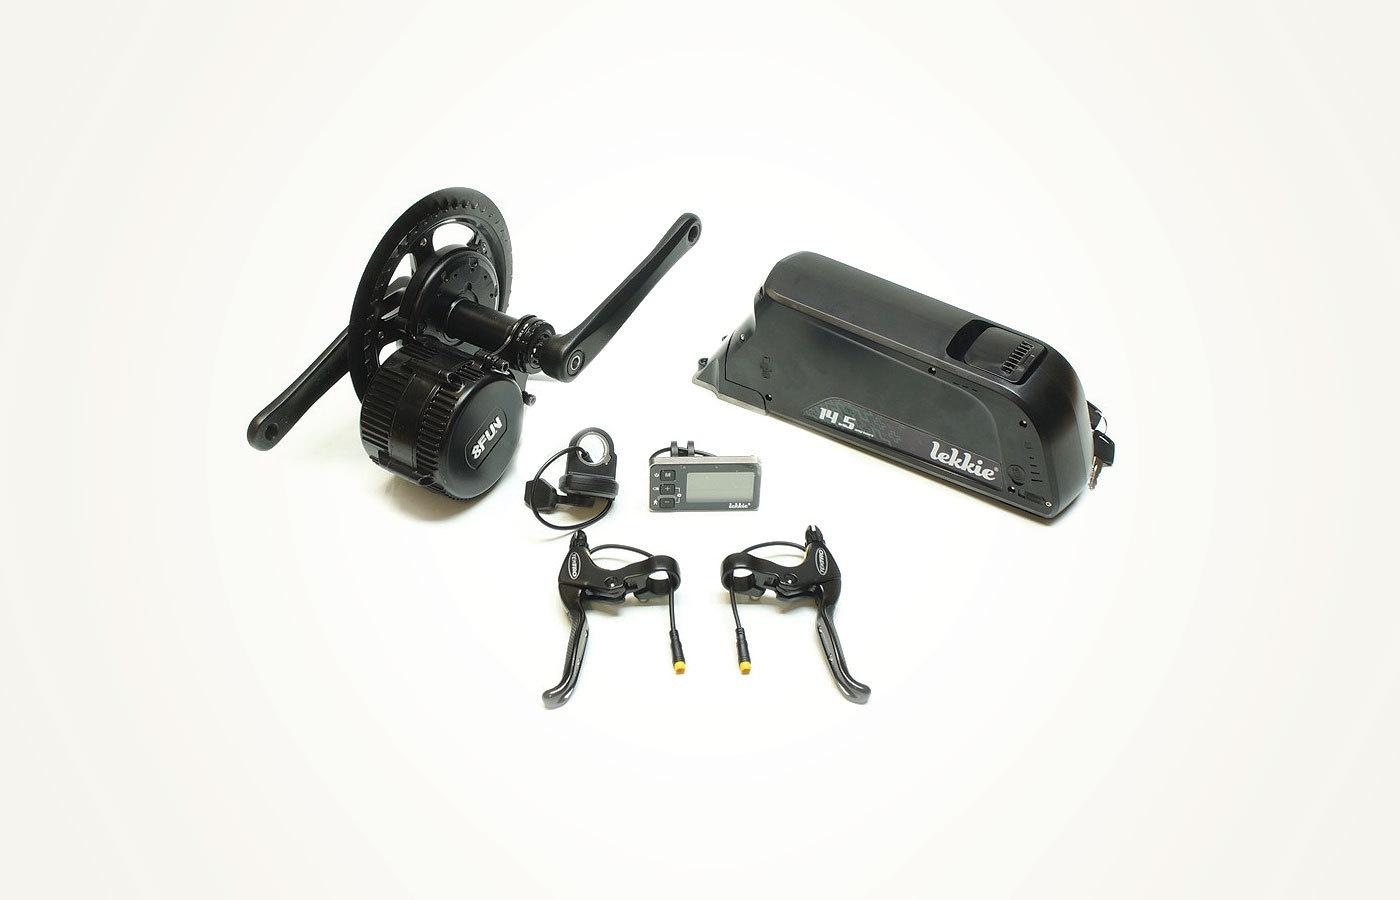 Lekkie Summit Electric Bike Kit